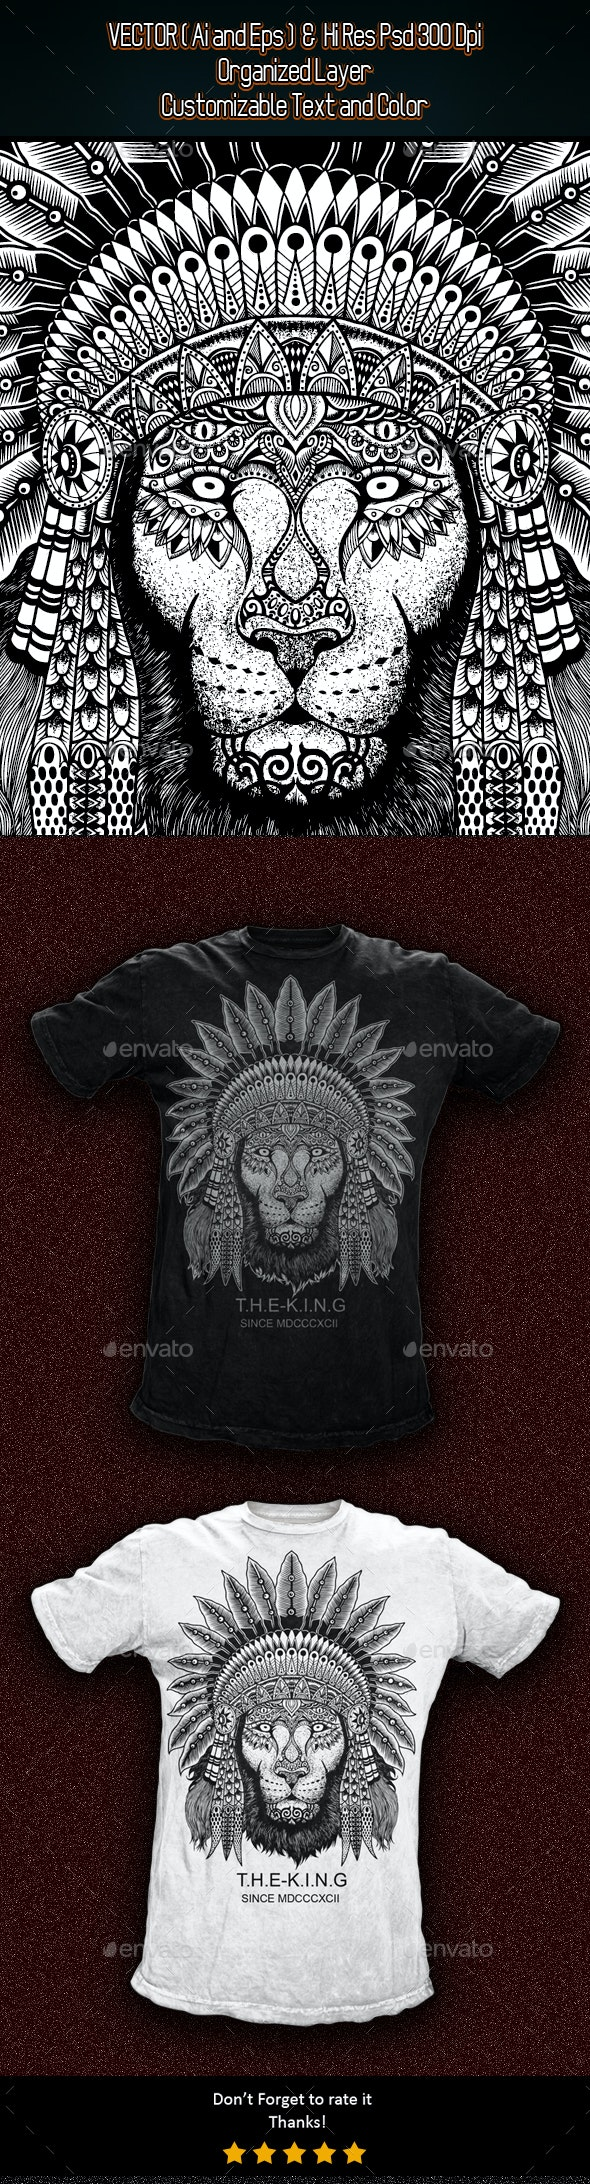 The King - Grunge Designs